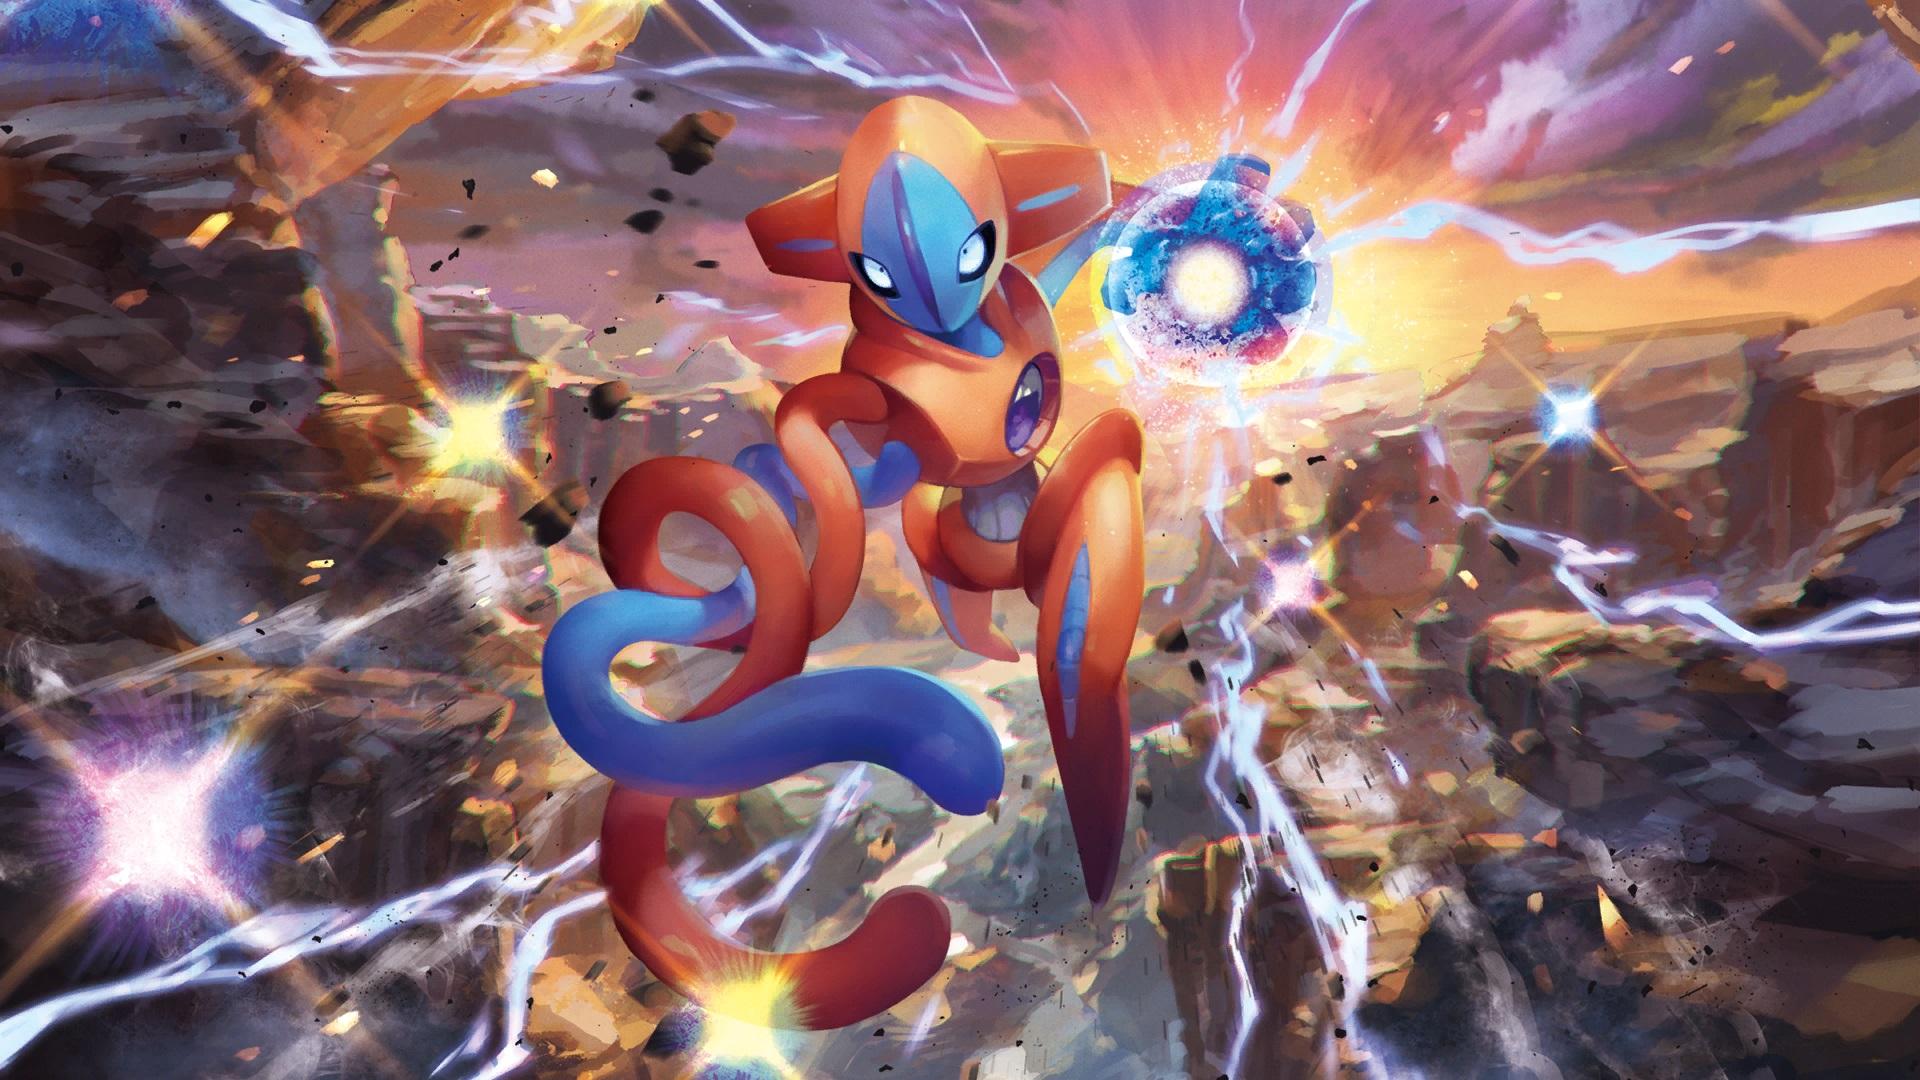 Pokémon HD Wallpaper | Background Image | 1920x1080 | ID ...